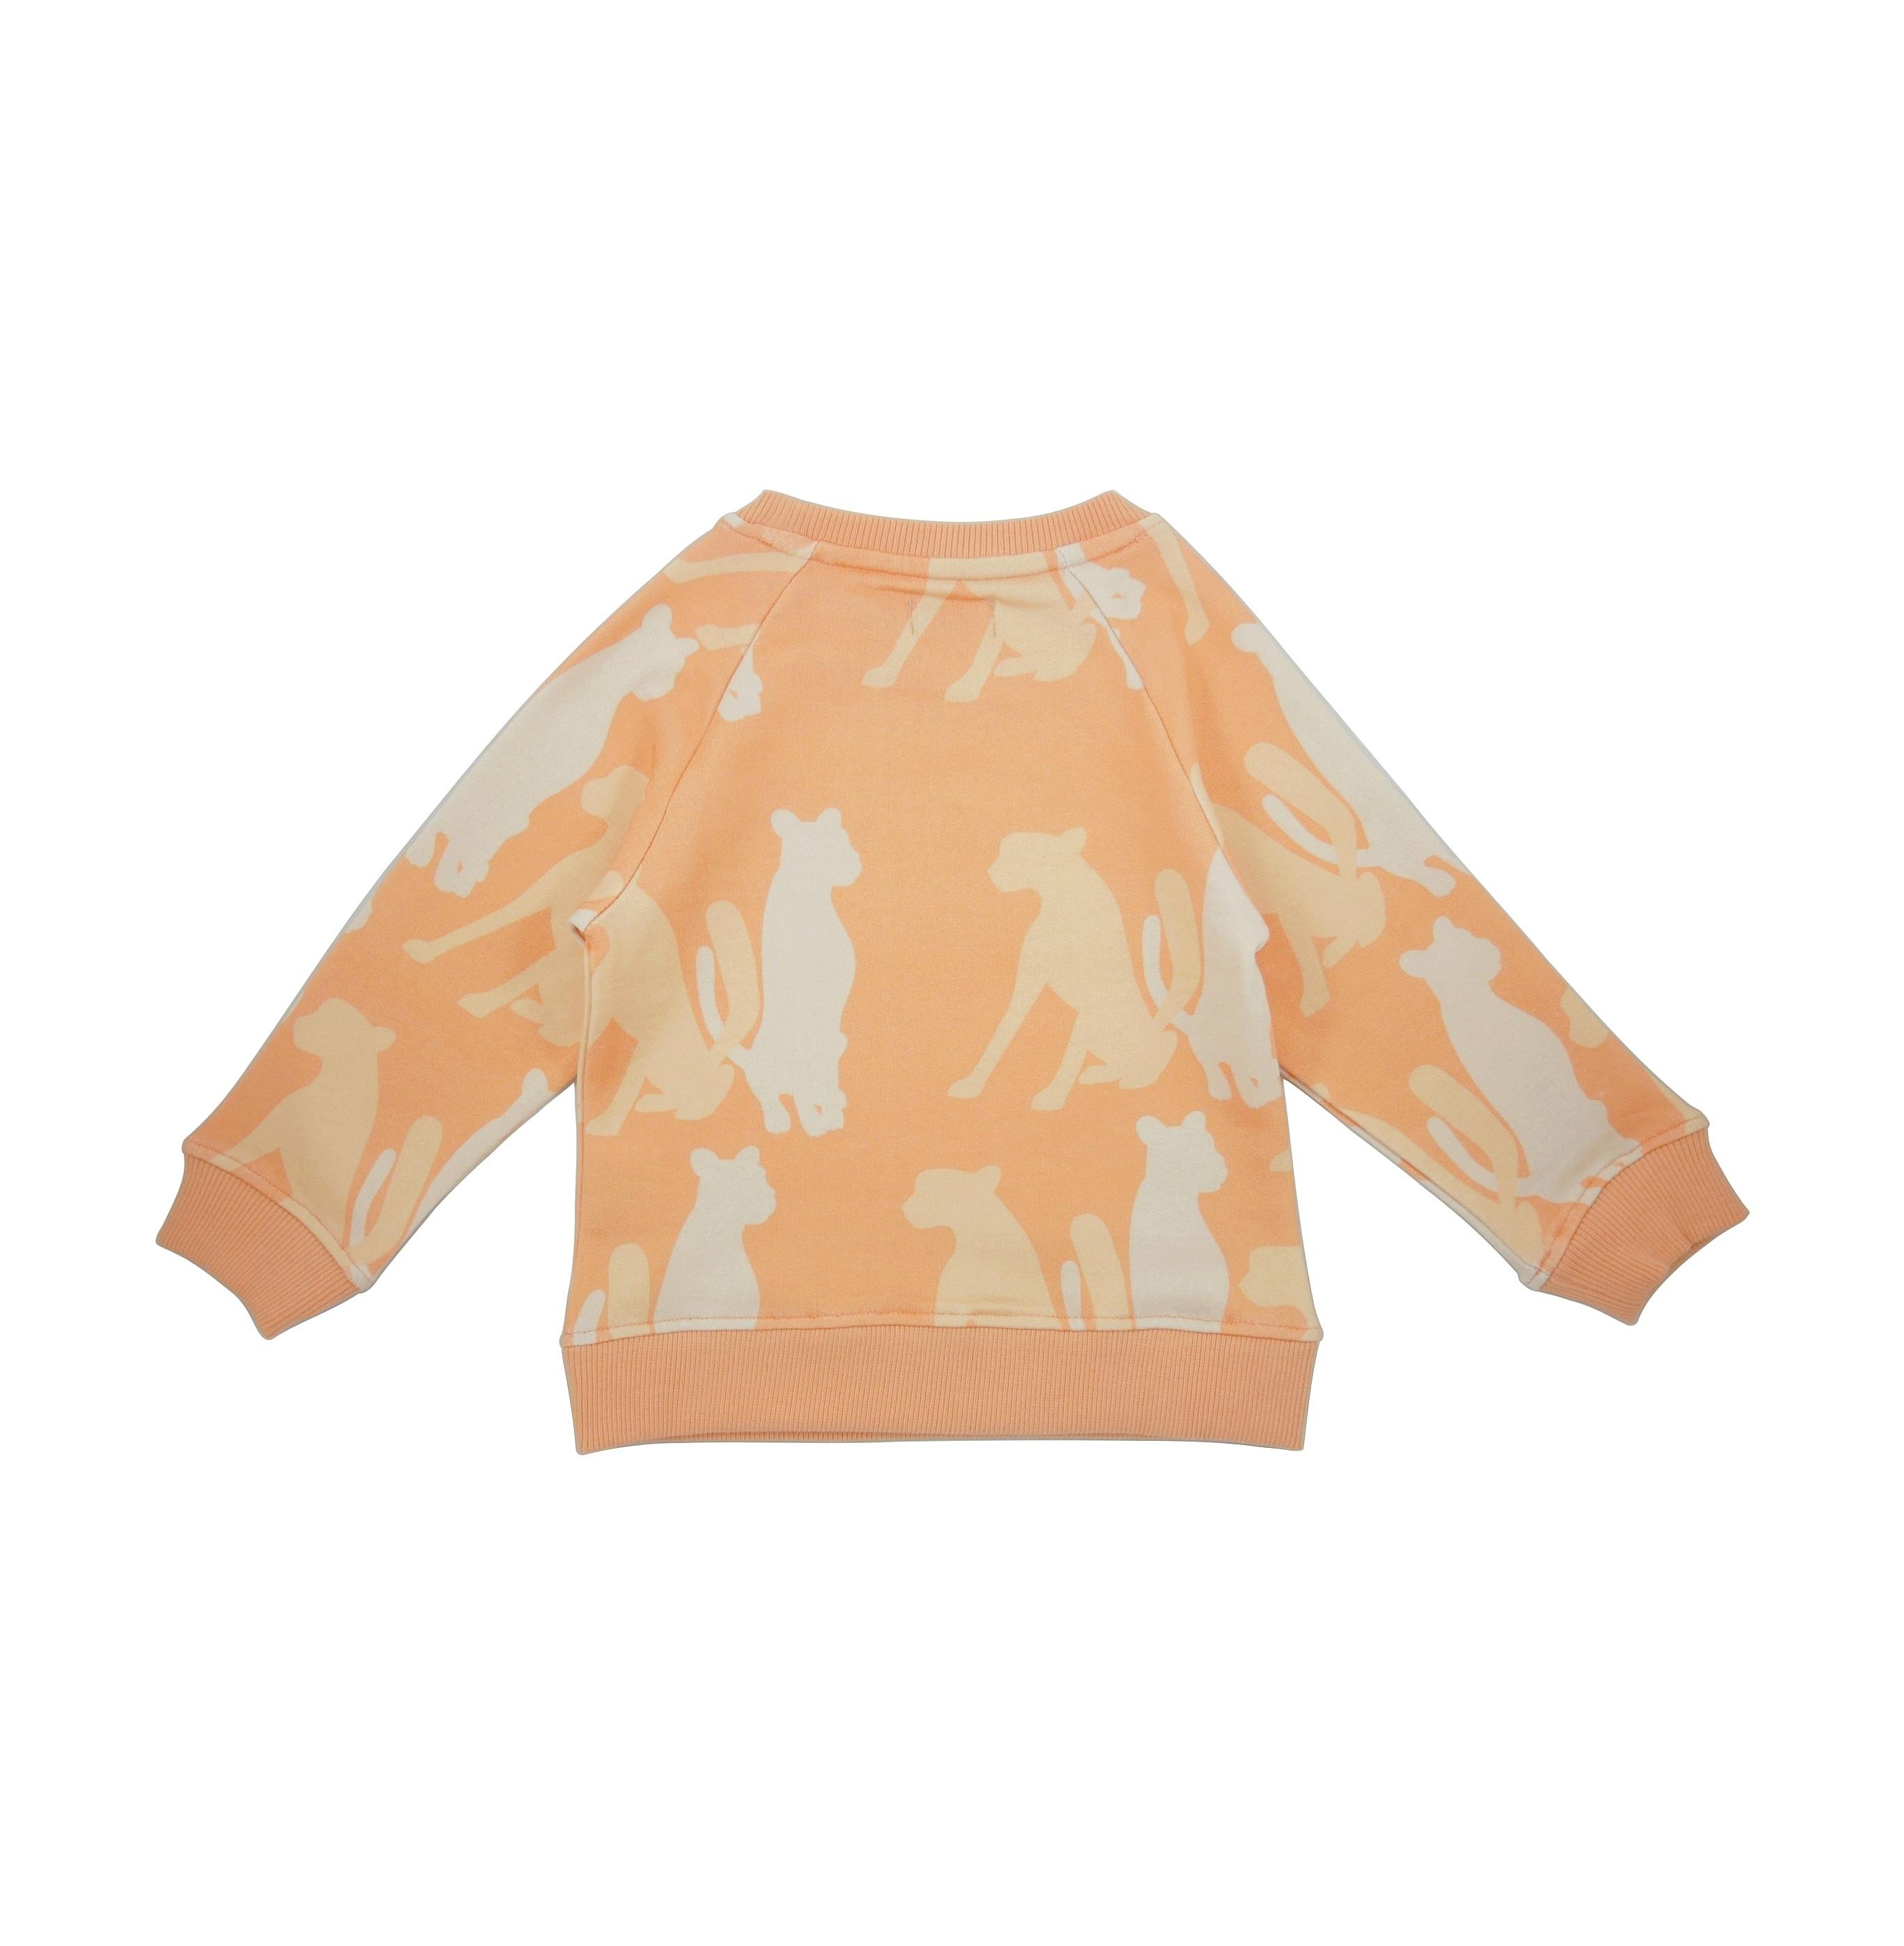 19SSSS Sweatshirt Cheetah Silouette back